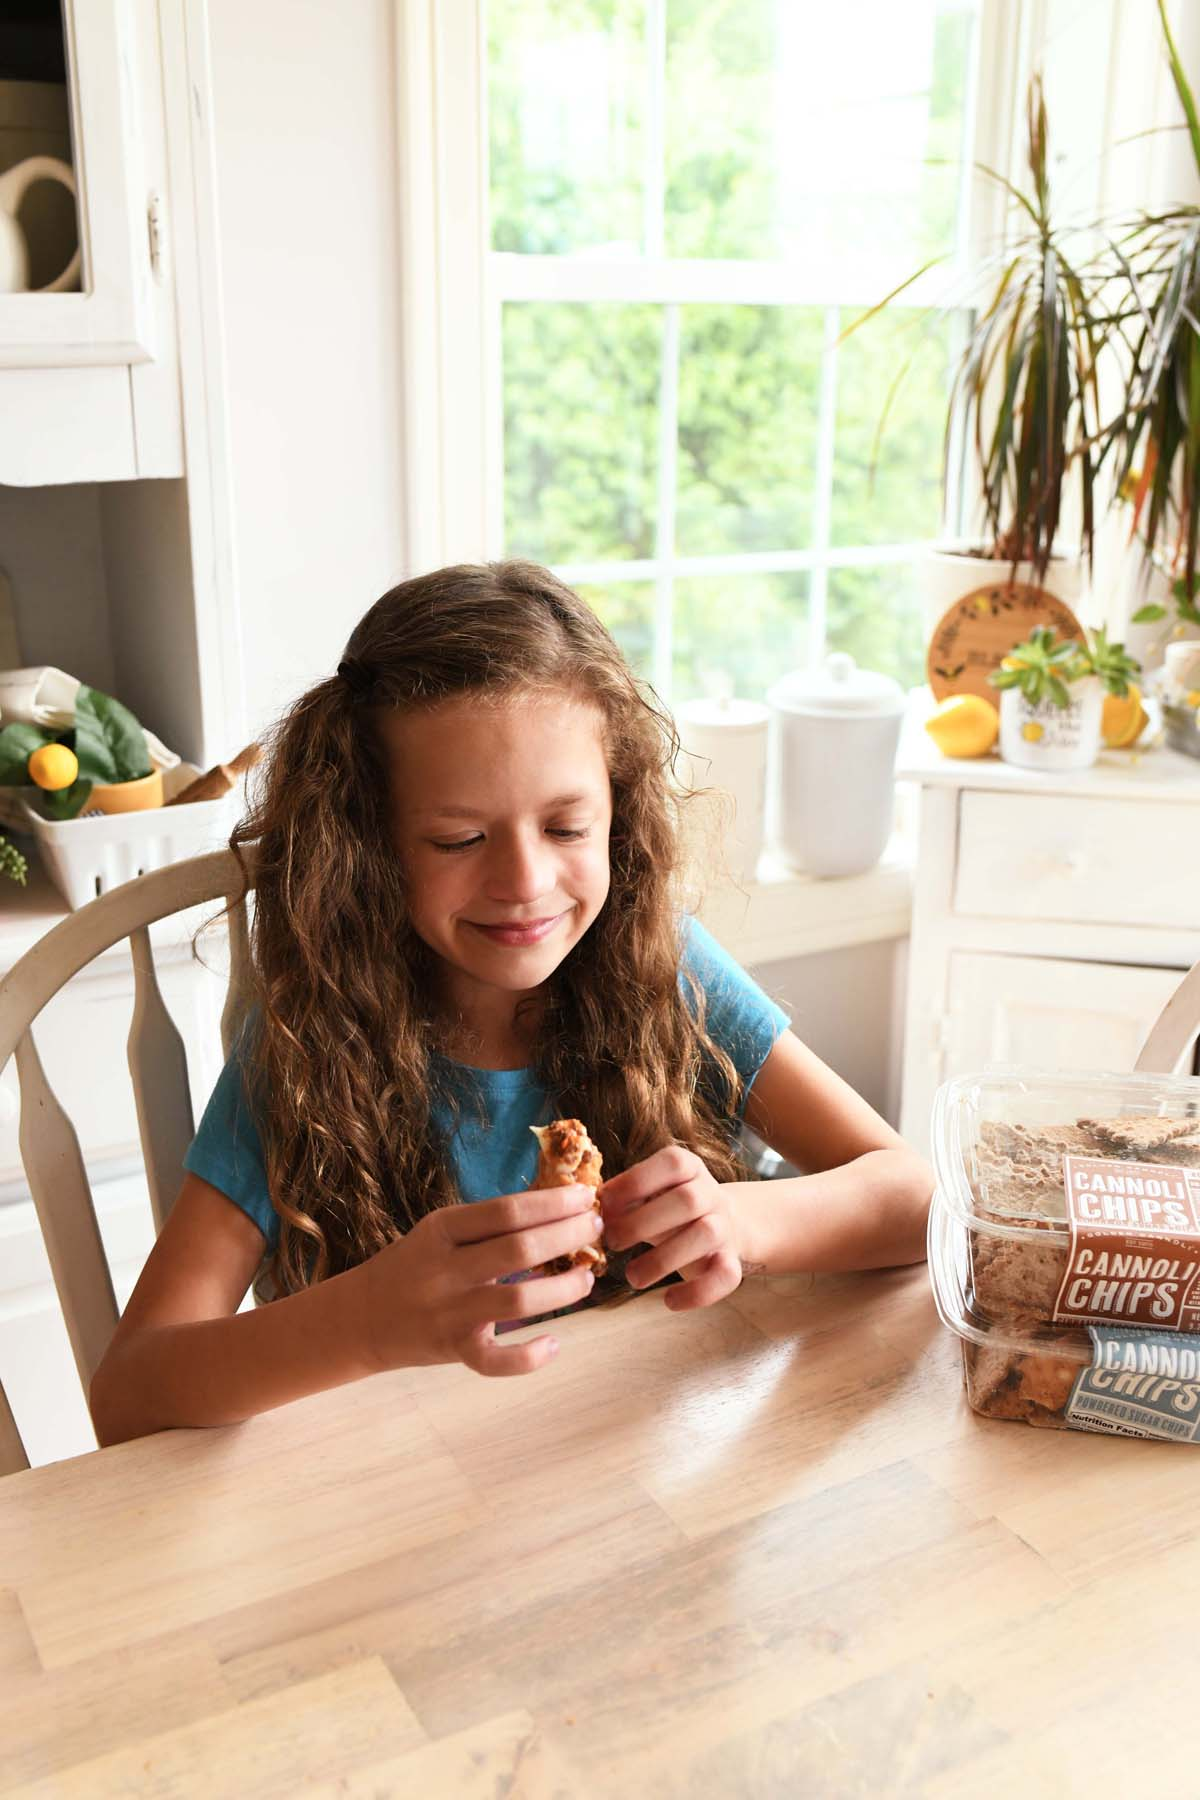 A little girl eating a cannoli.